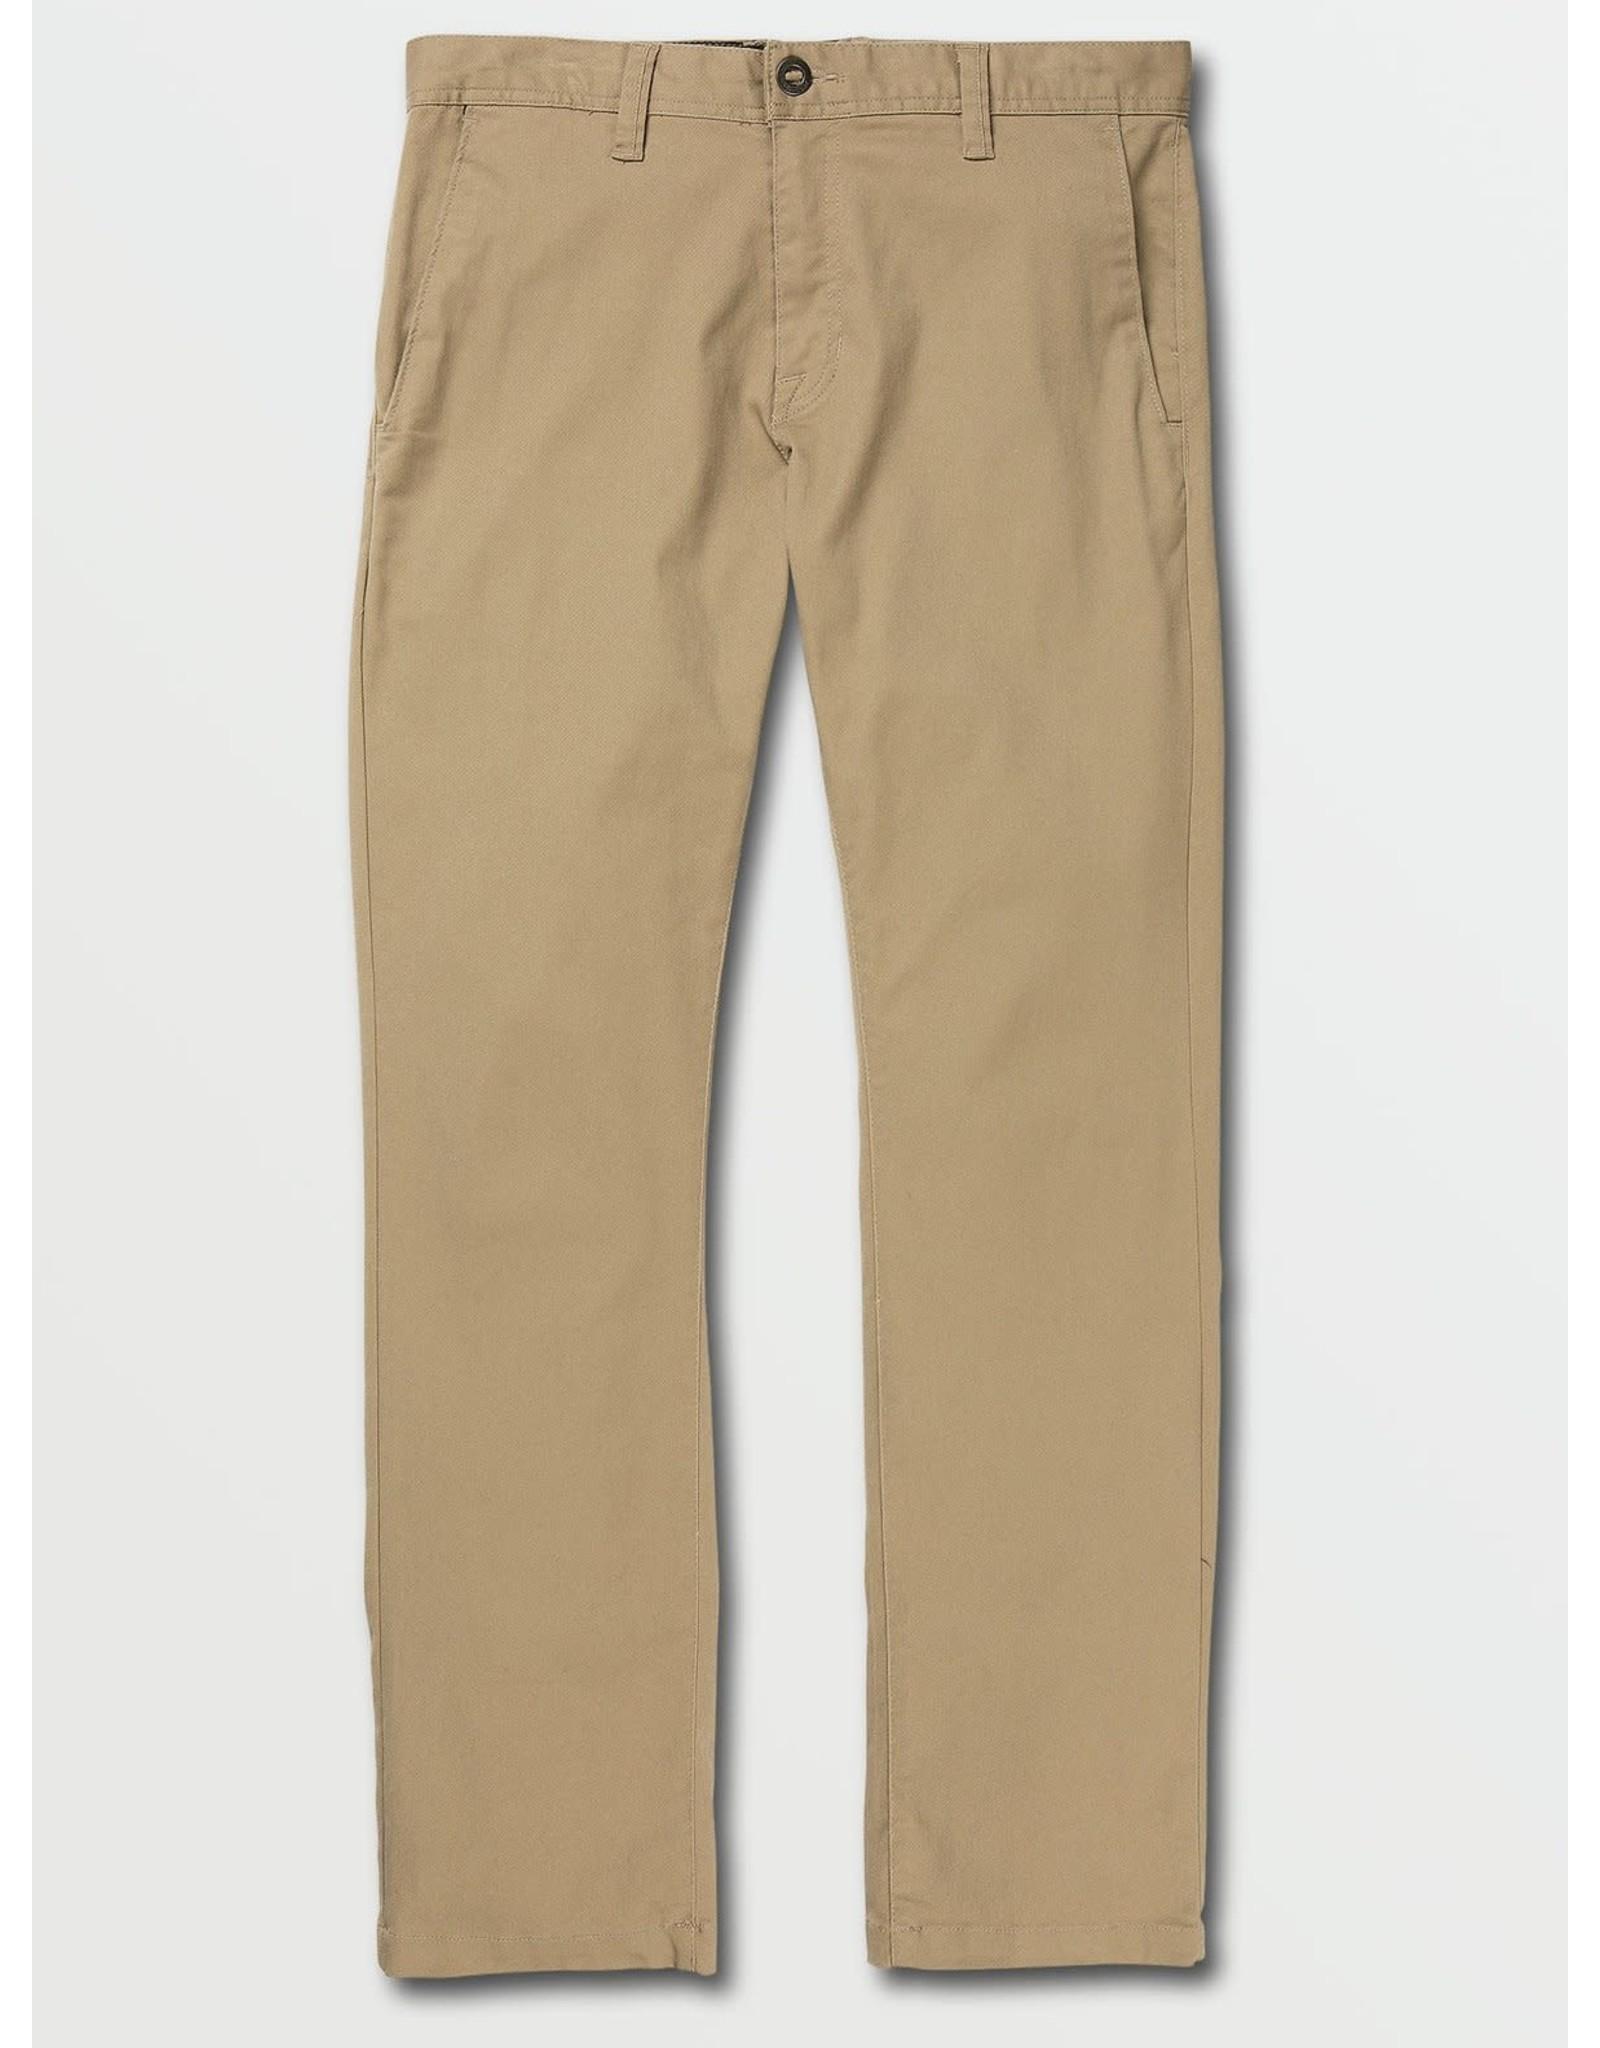 volcom Volcom - Pantalon homme frickin modern stretch khaki